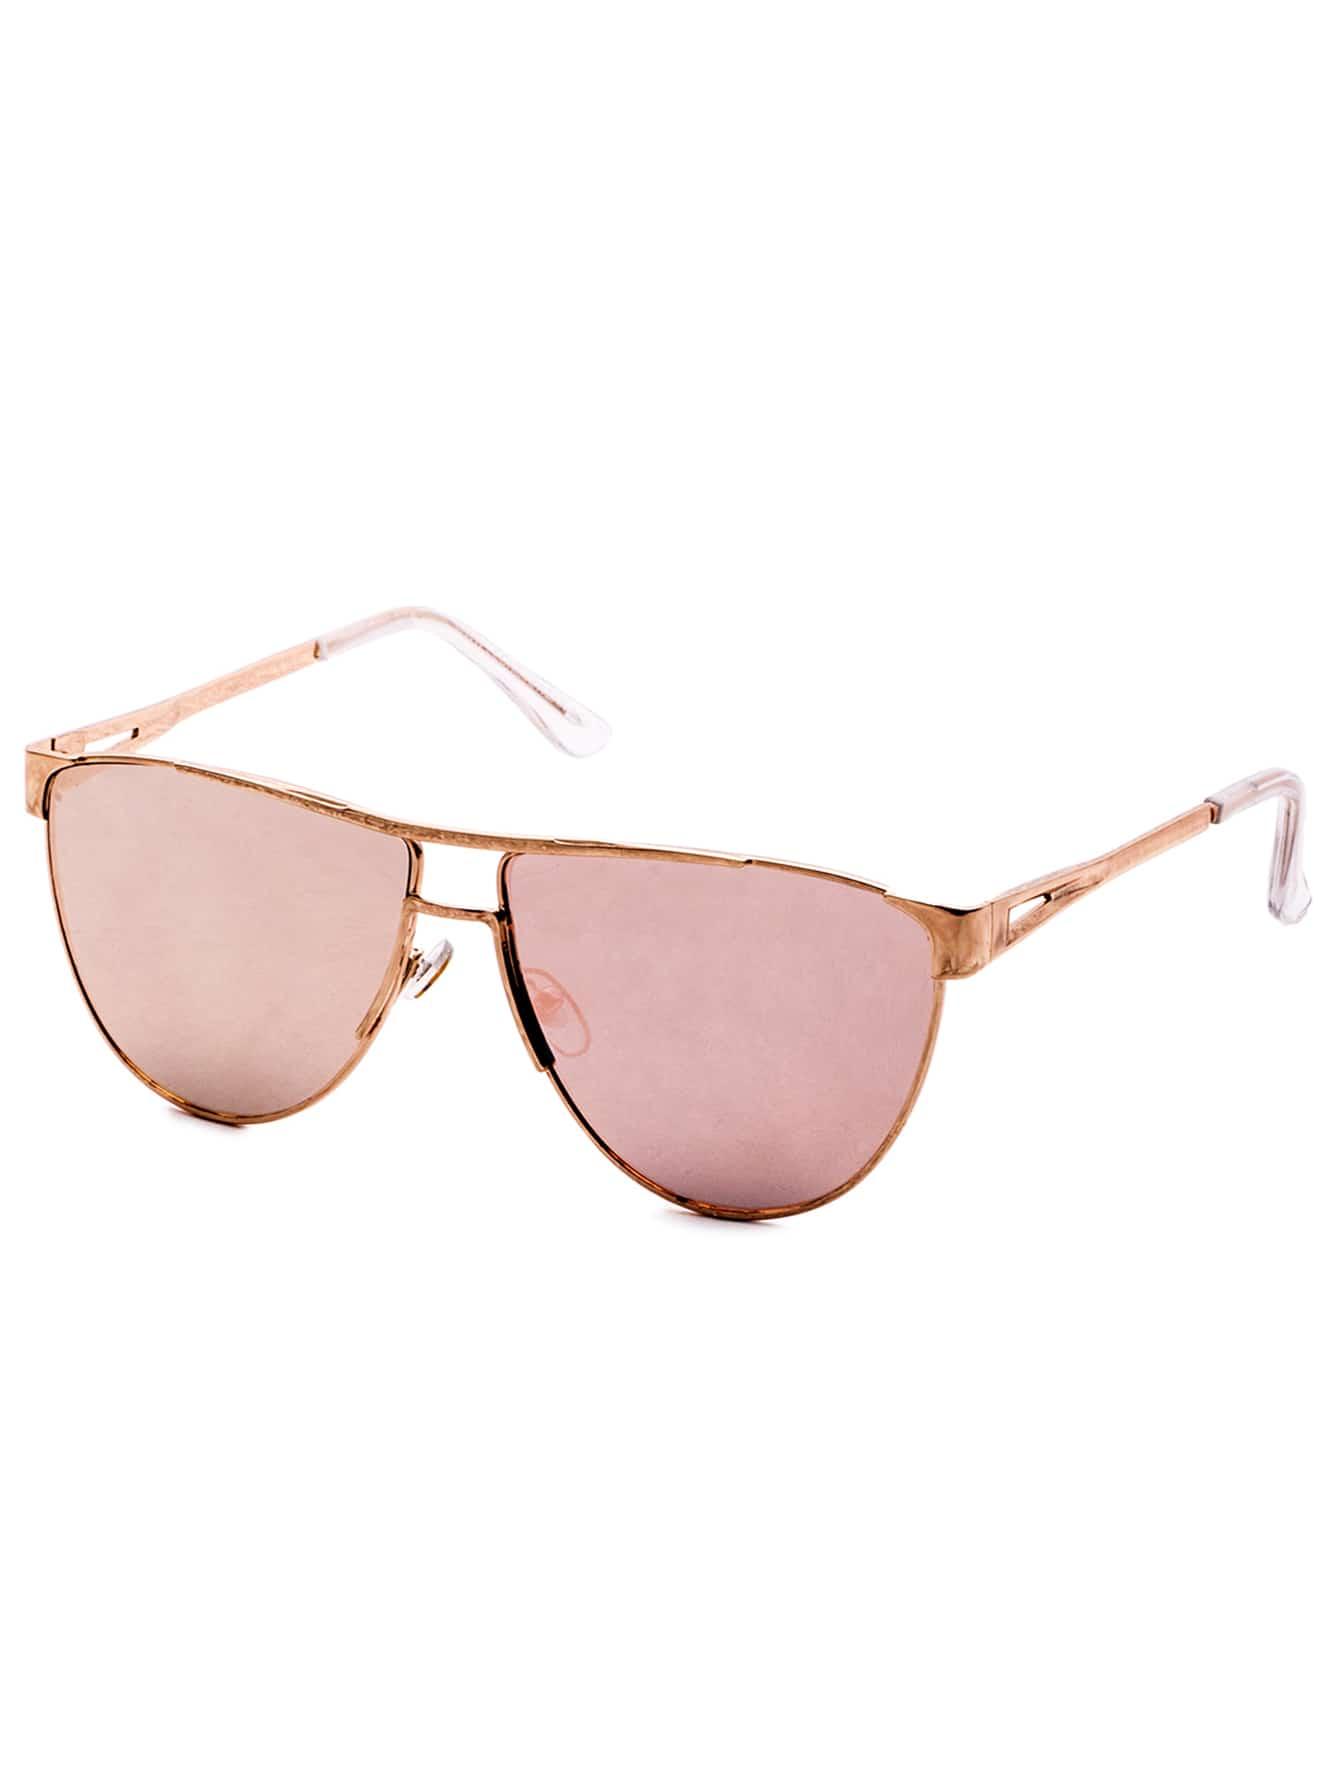 Gold Frame Double Bridge Pink Lens Sunglasses